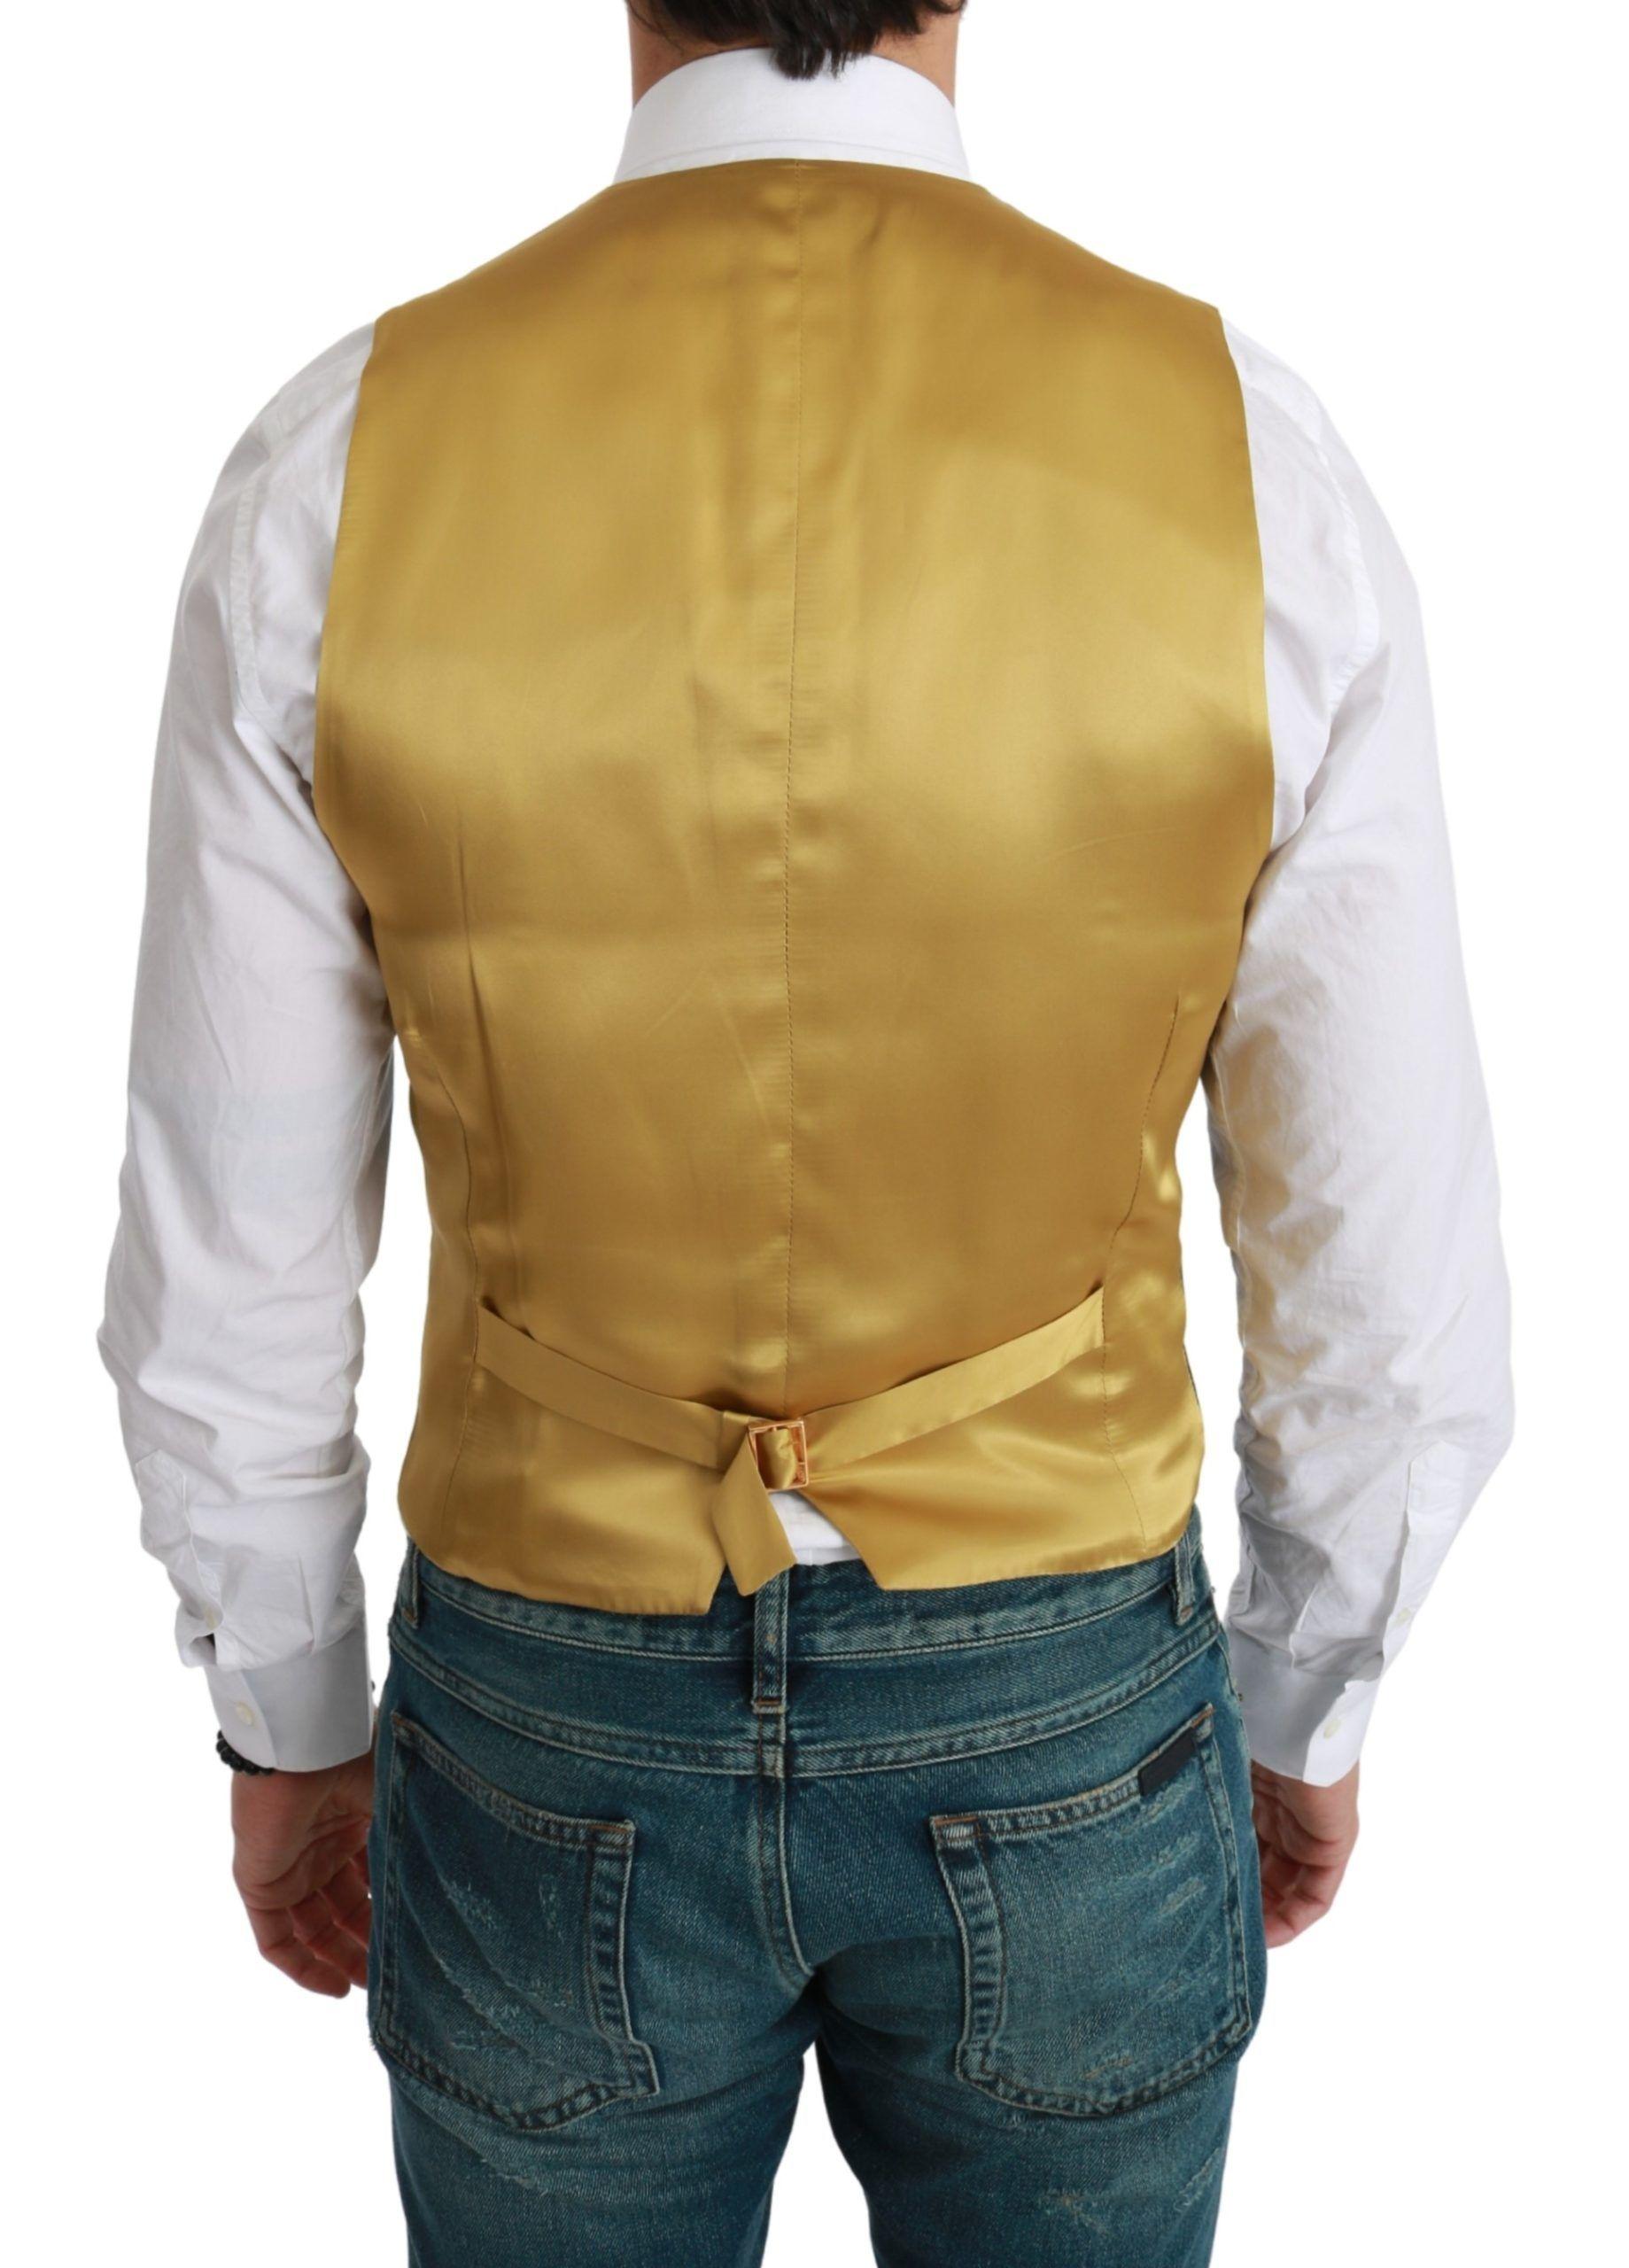 Dolce & Gabbana Black Gold Waistcoat Formal Wool Stretch Vest